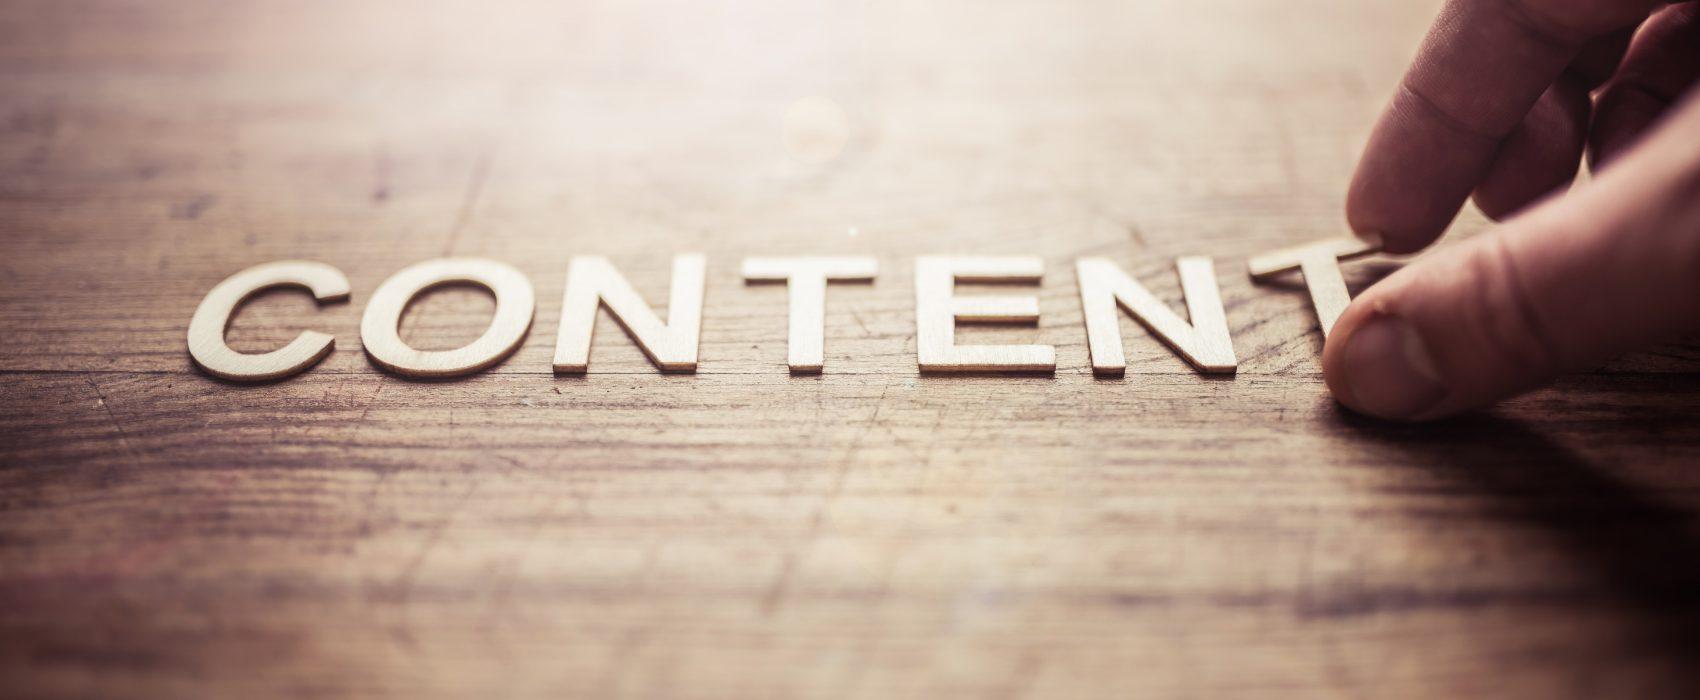 content marketing hero image